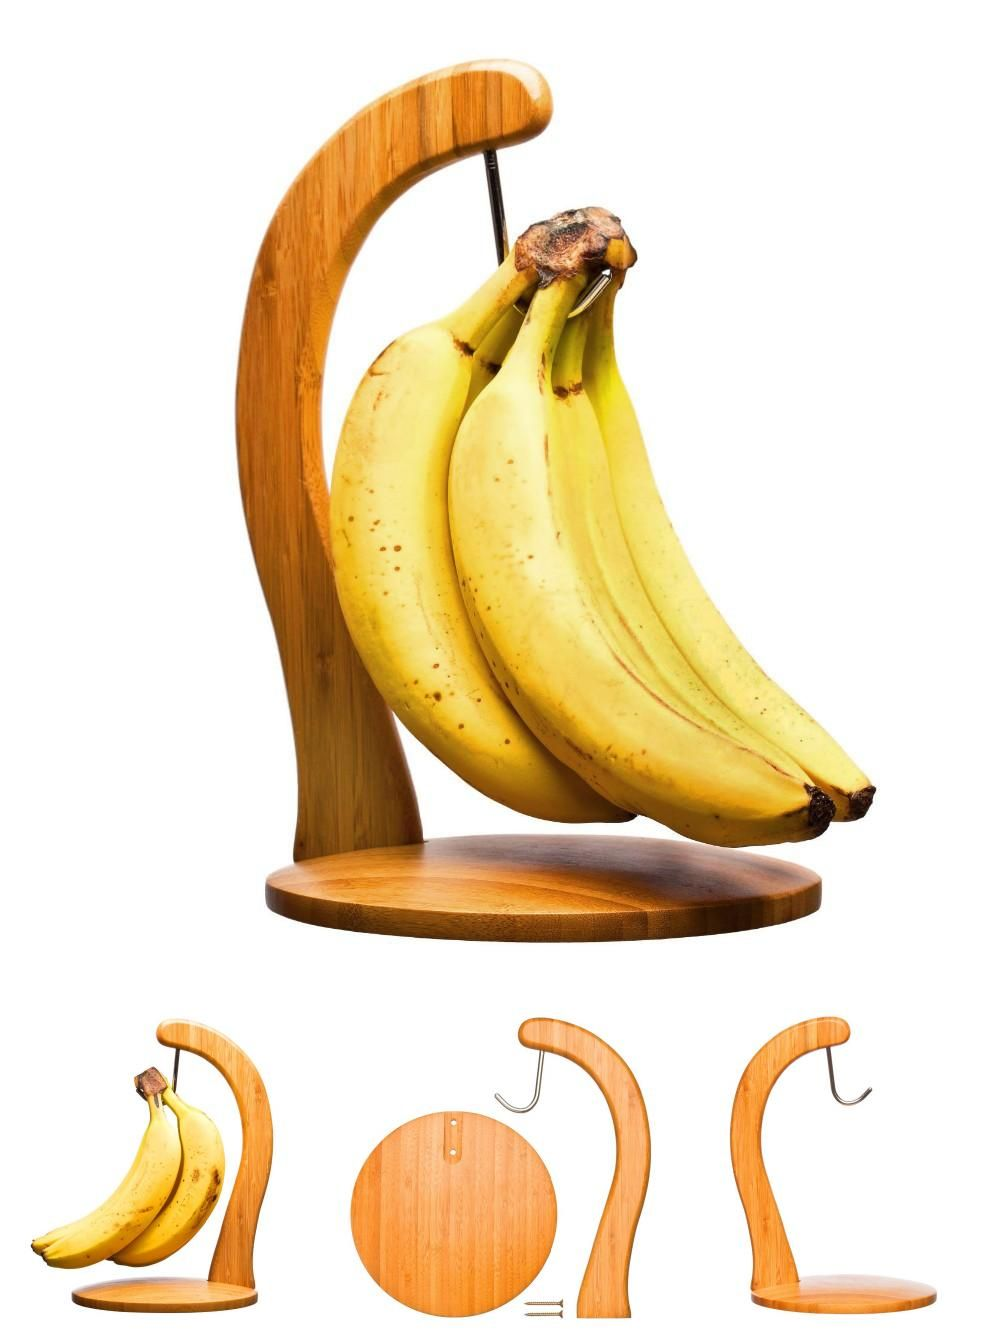 Wooden Banana Hanger Fruit Kitchen Holder Hook Stand Rack Wood